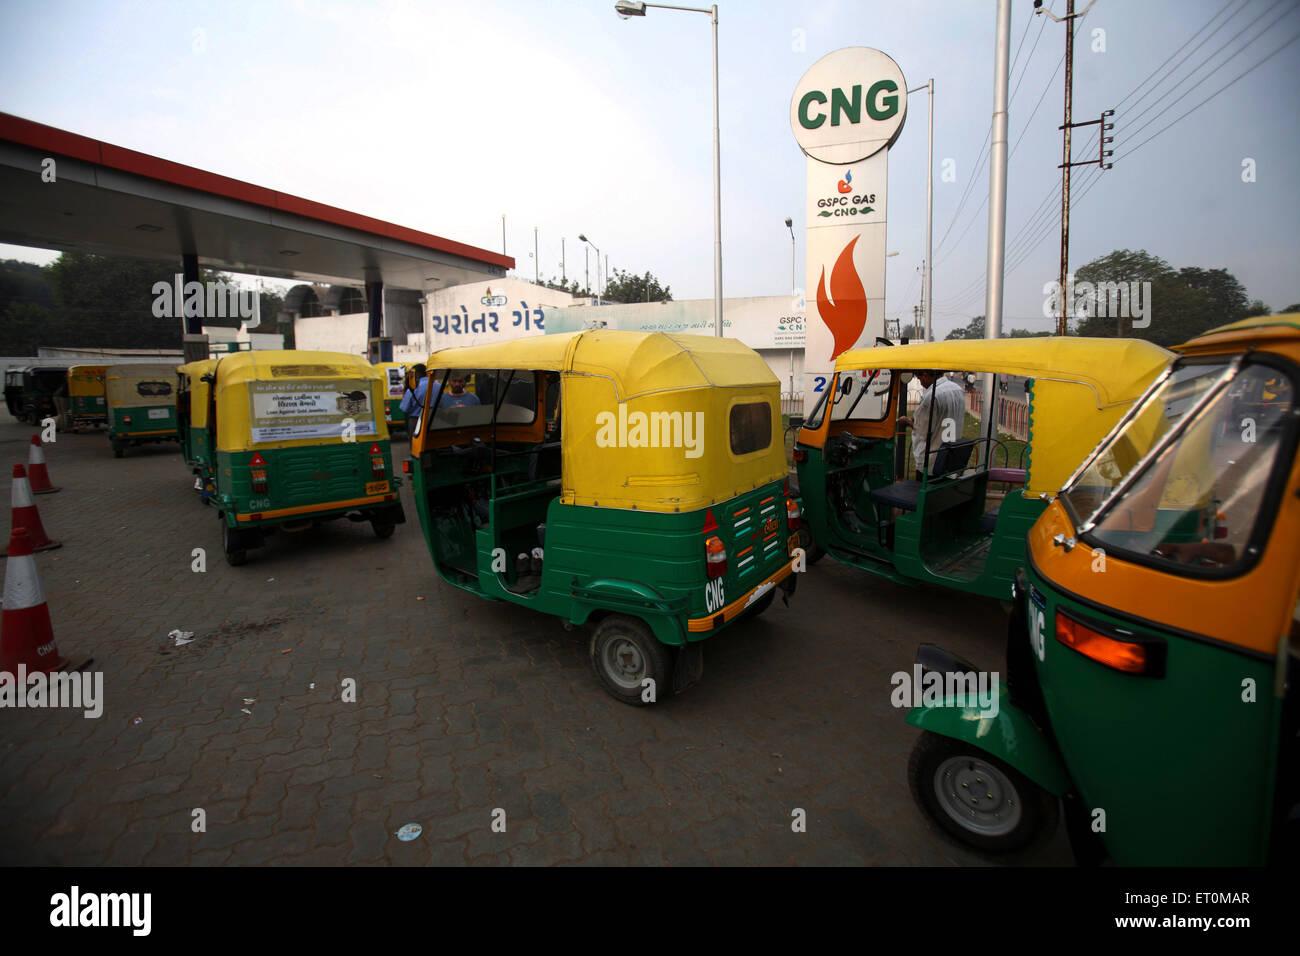 Auto rickshaws refilling fuel at CNG petrol pump ; India - Stock Image